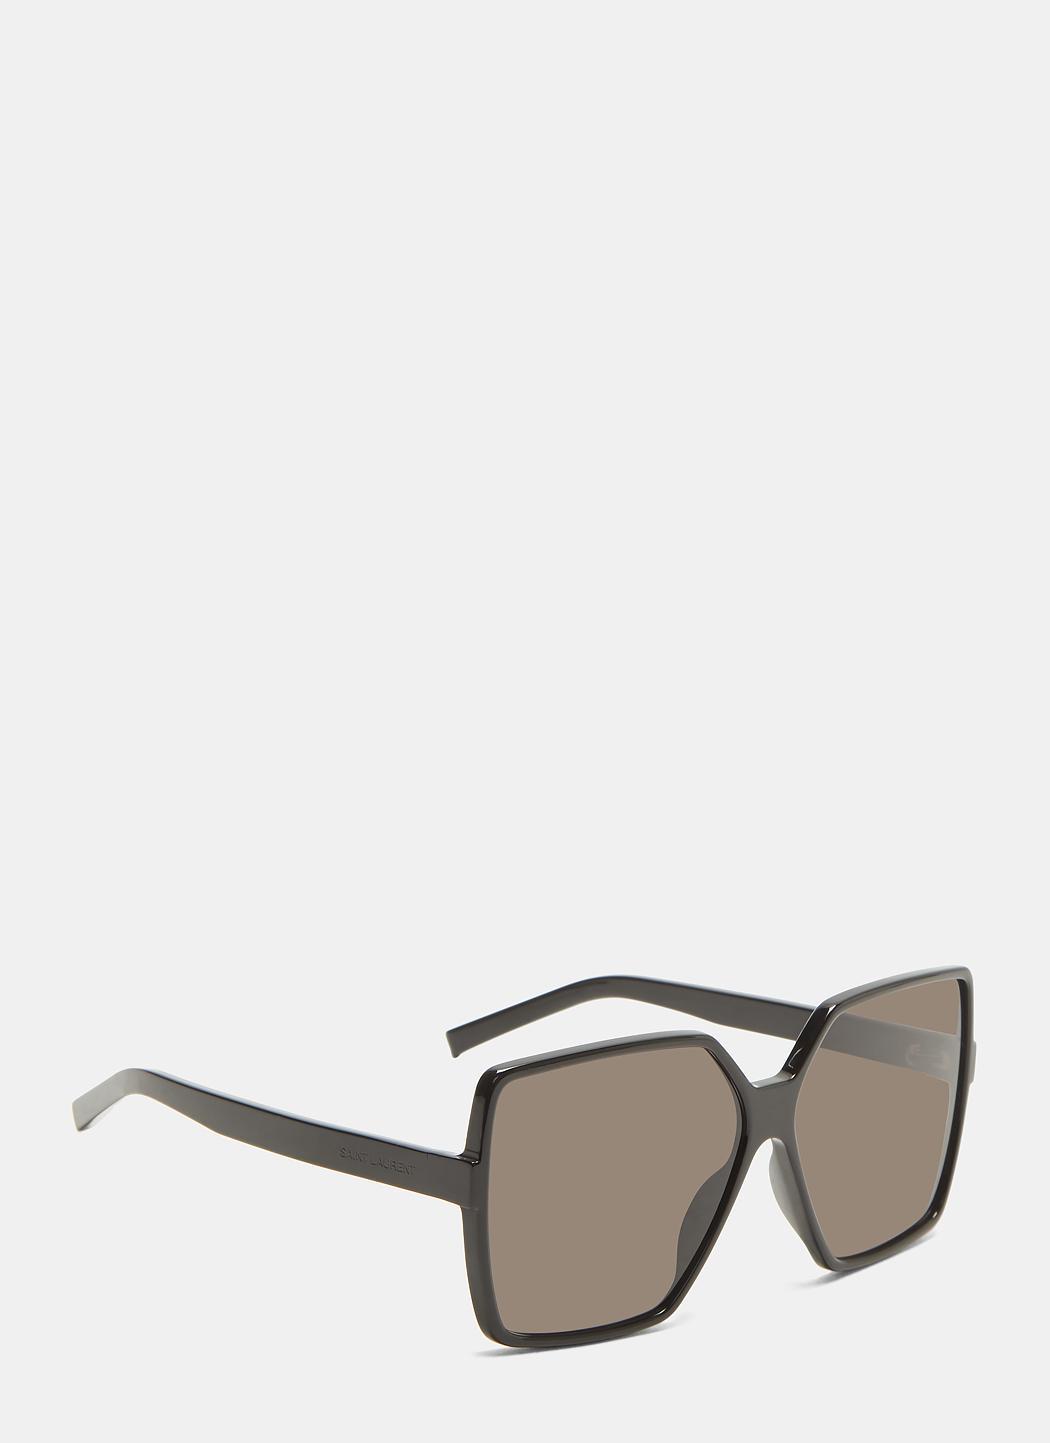 Saint Laurent New Wave 232 Betty Sunglasses atg7LDoK